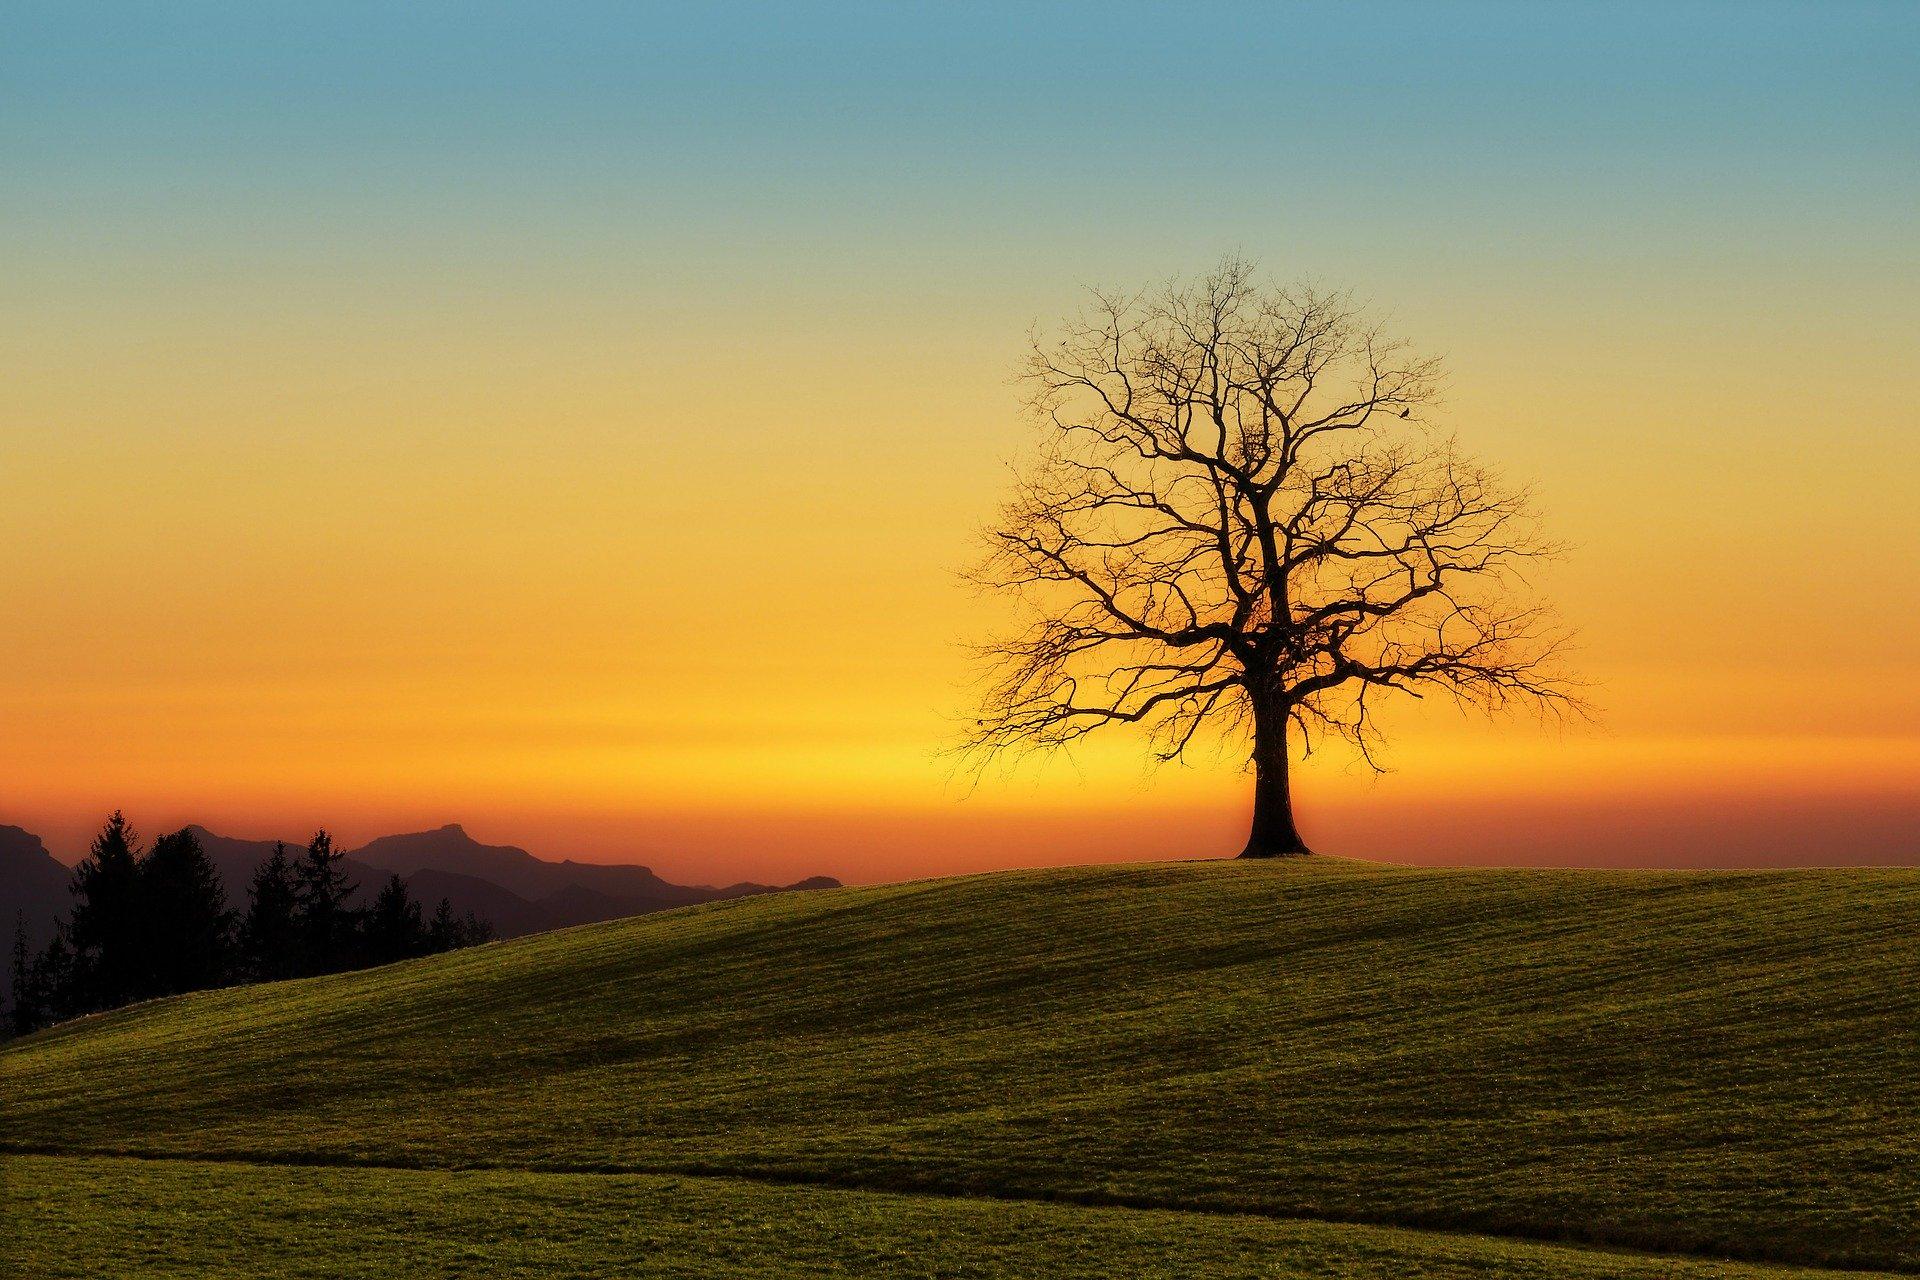 tree-3072431_1920